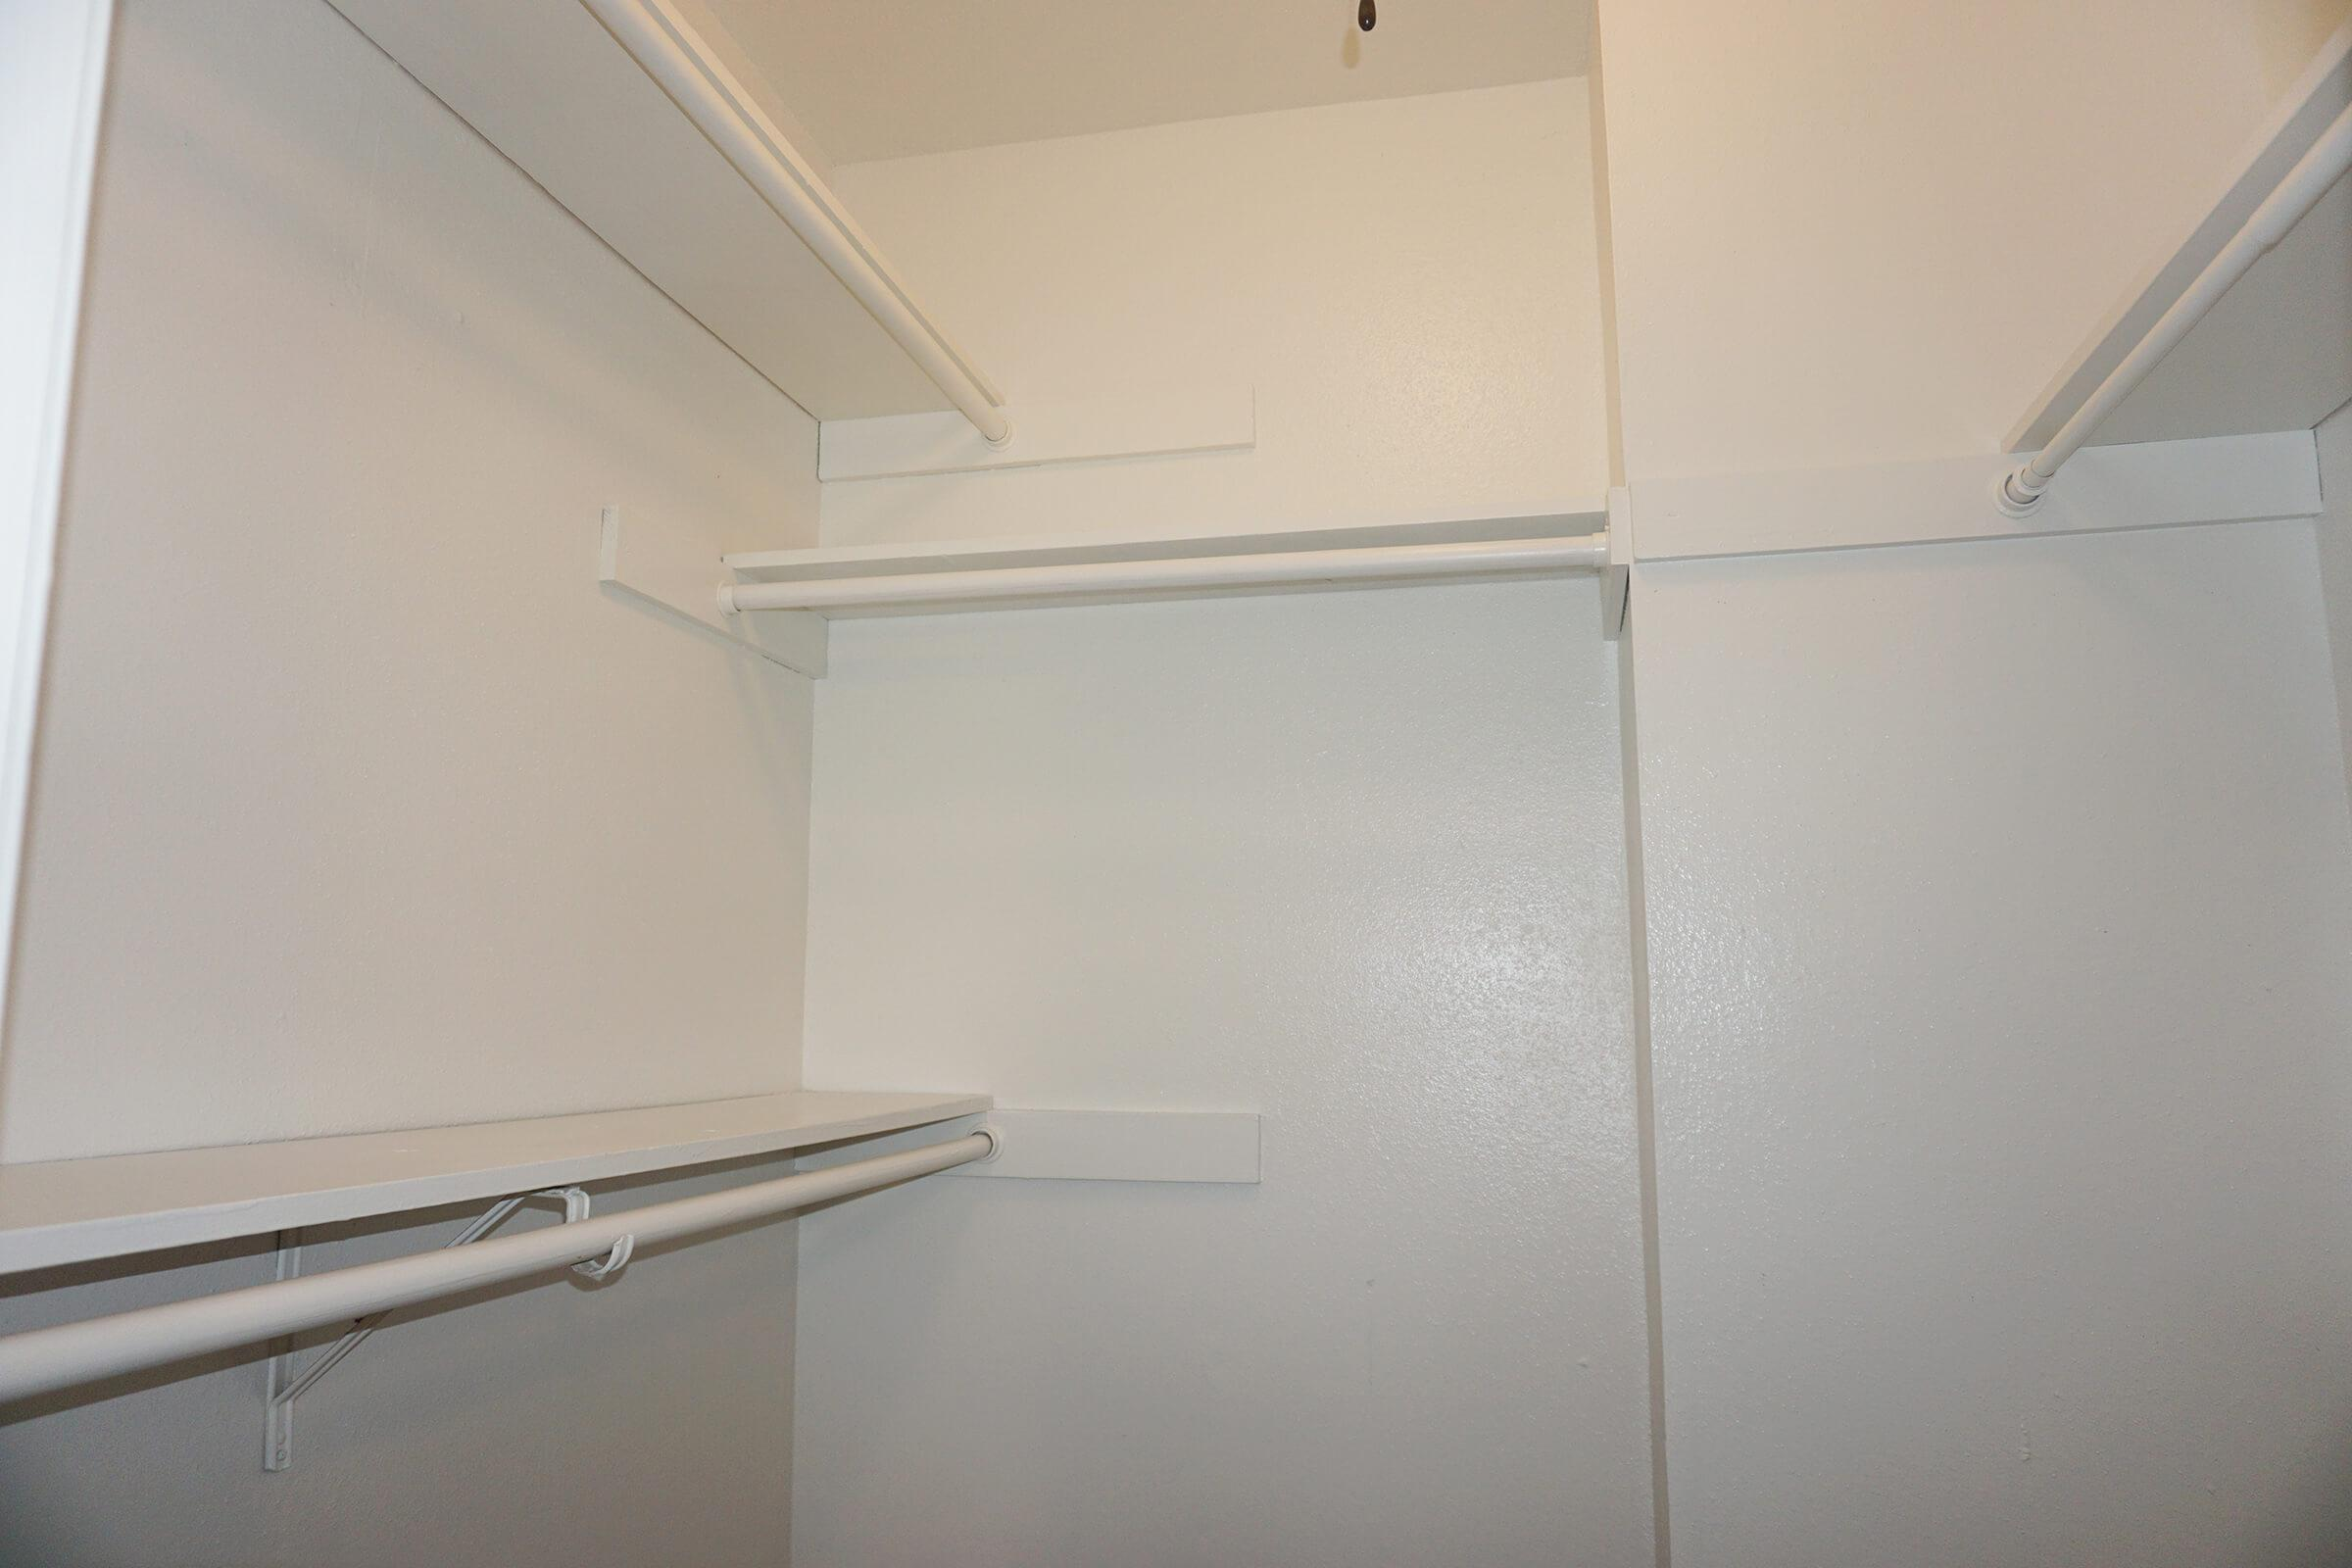 a white refrigerator freezer sitting inside of a building